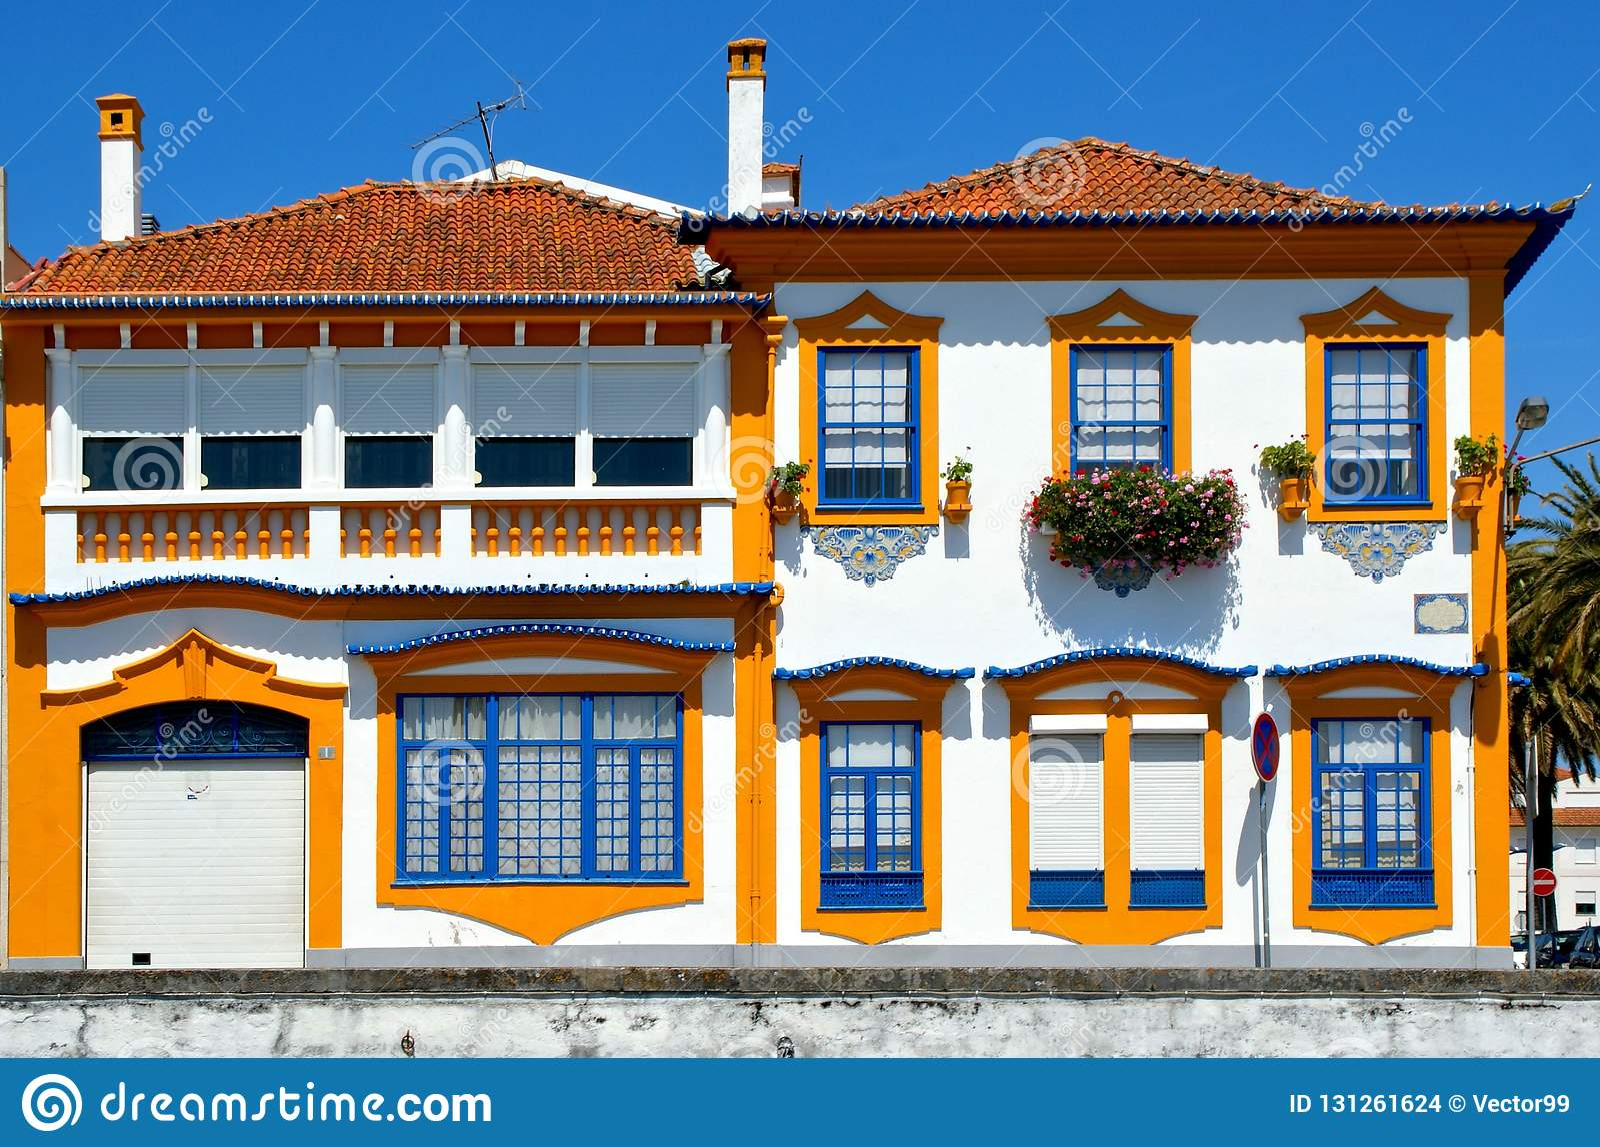 Дома в португалии фото дубай башня халифа цена билета